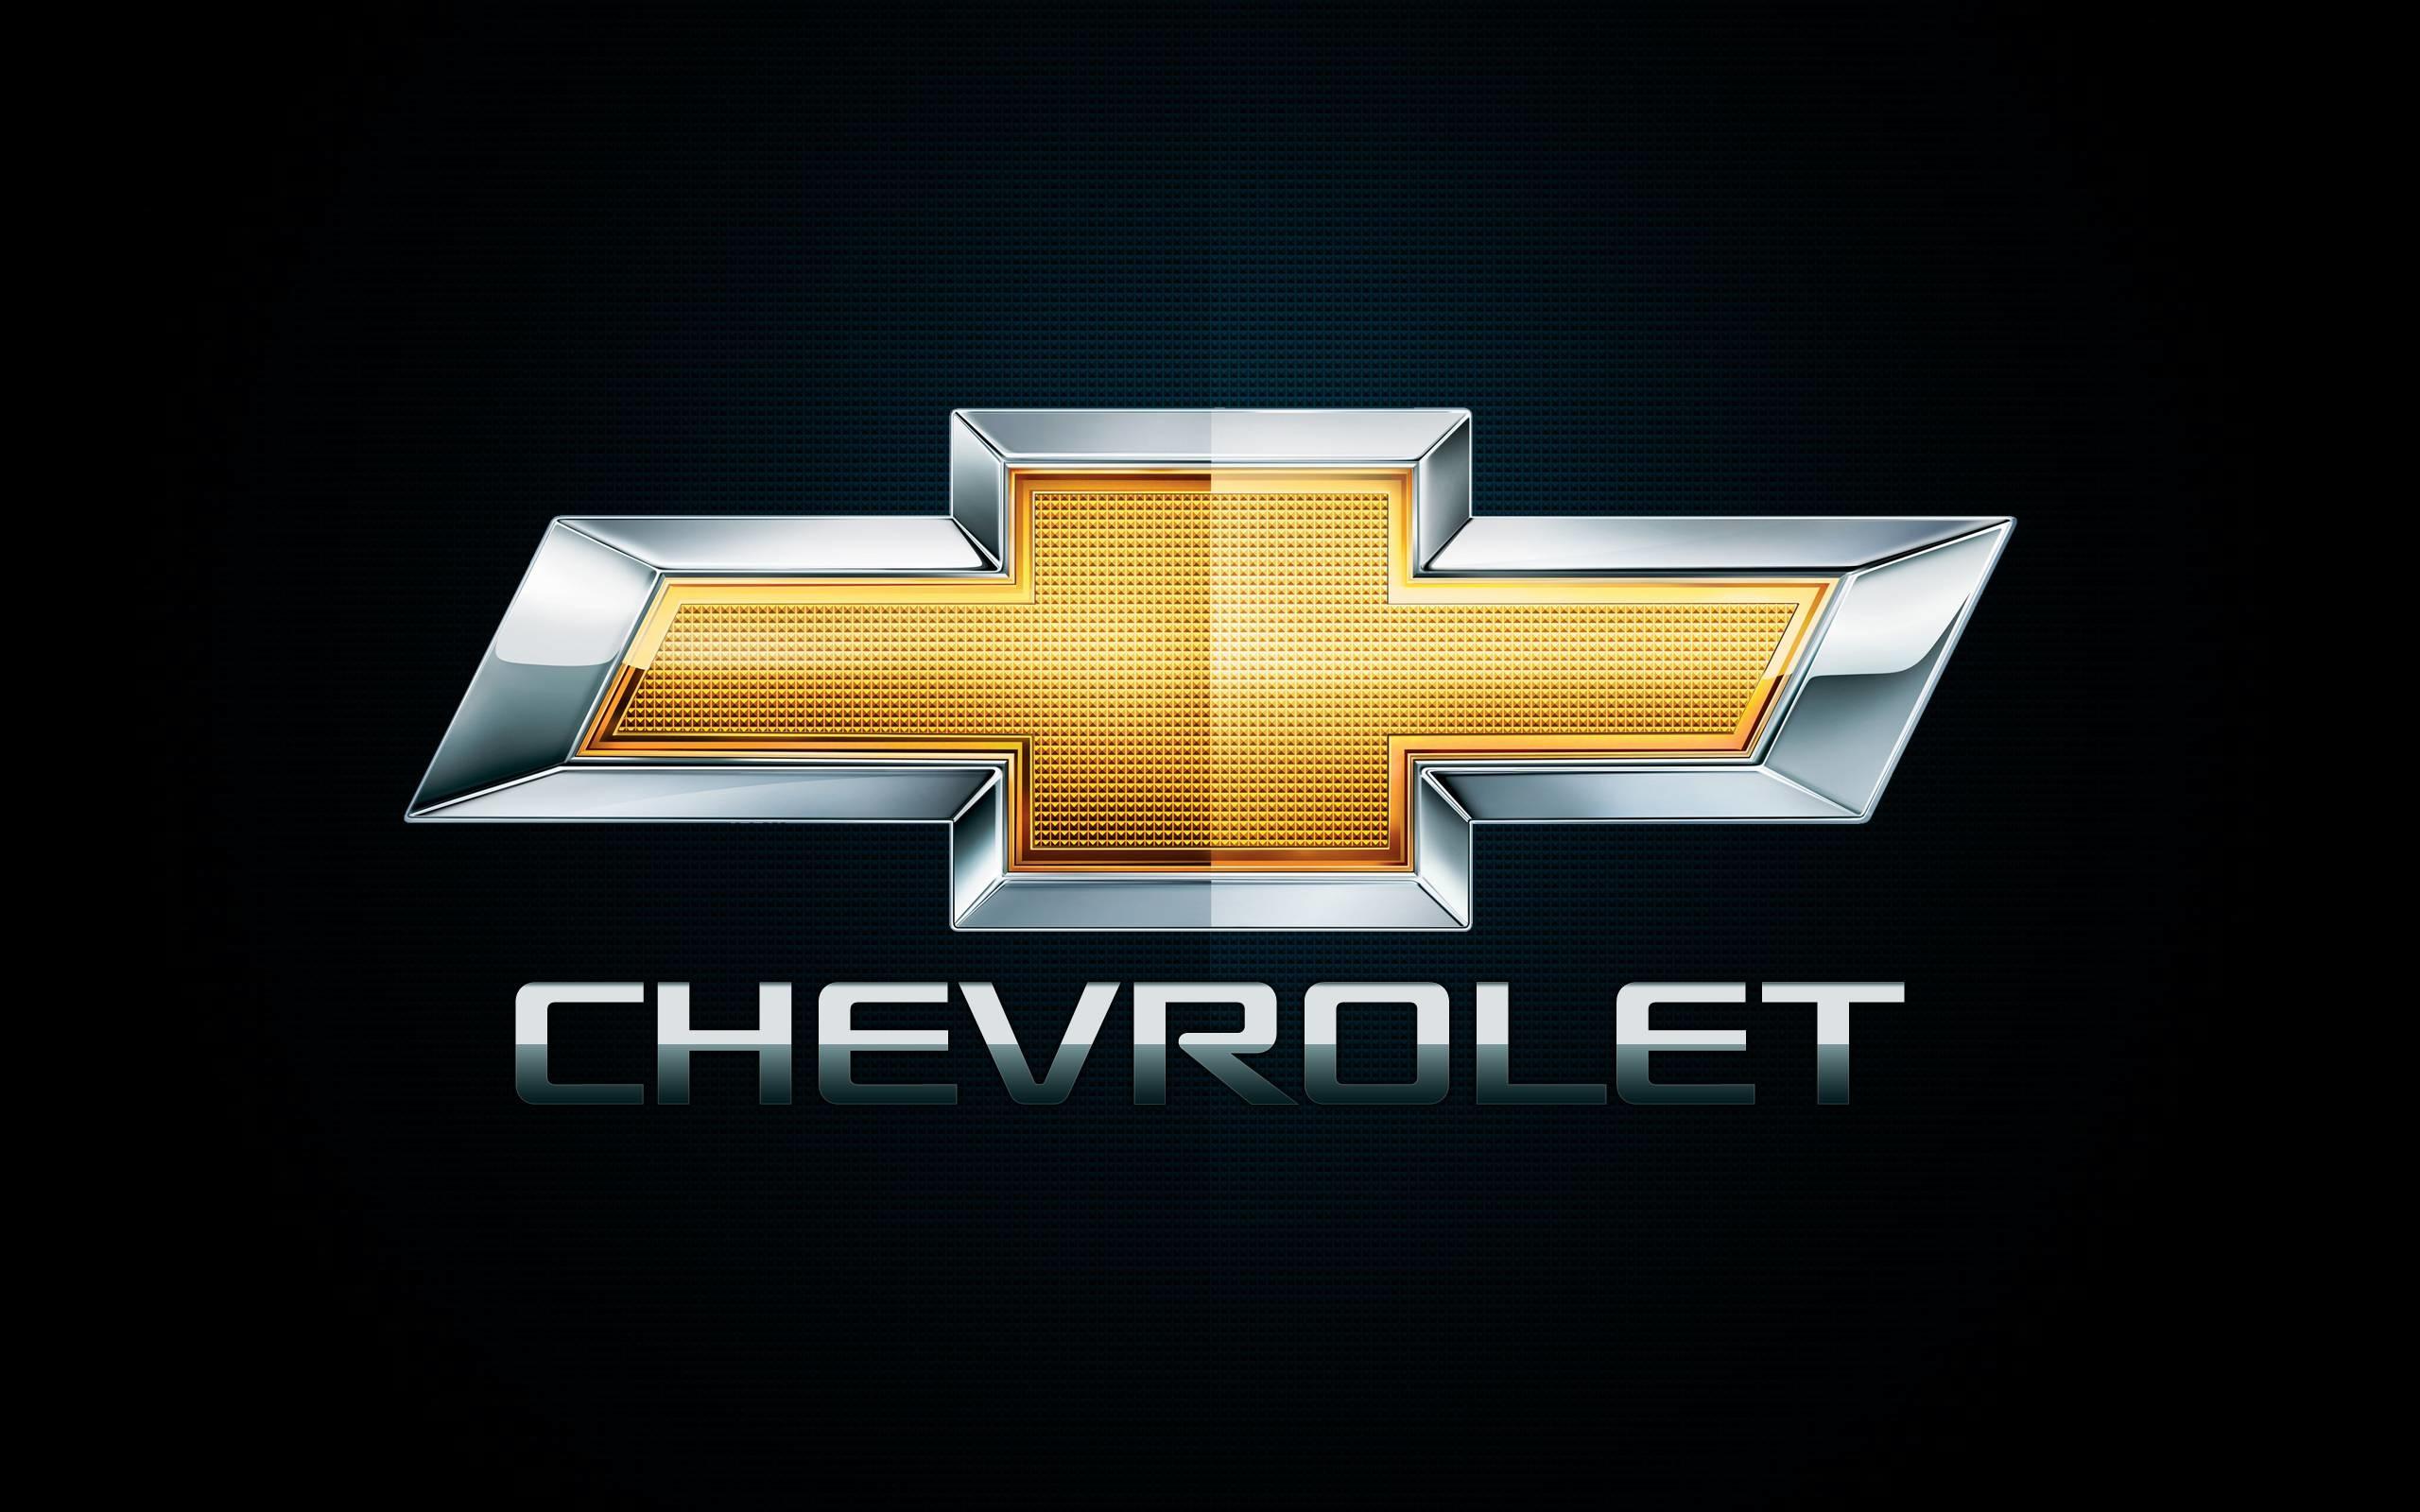 Chevrolet Logo Wallpapers – Full HD wallpaper search